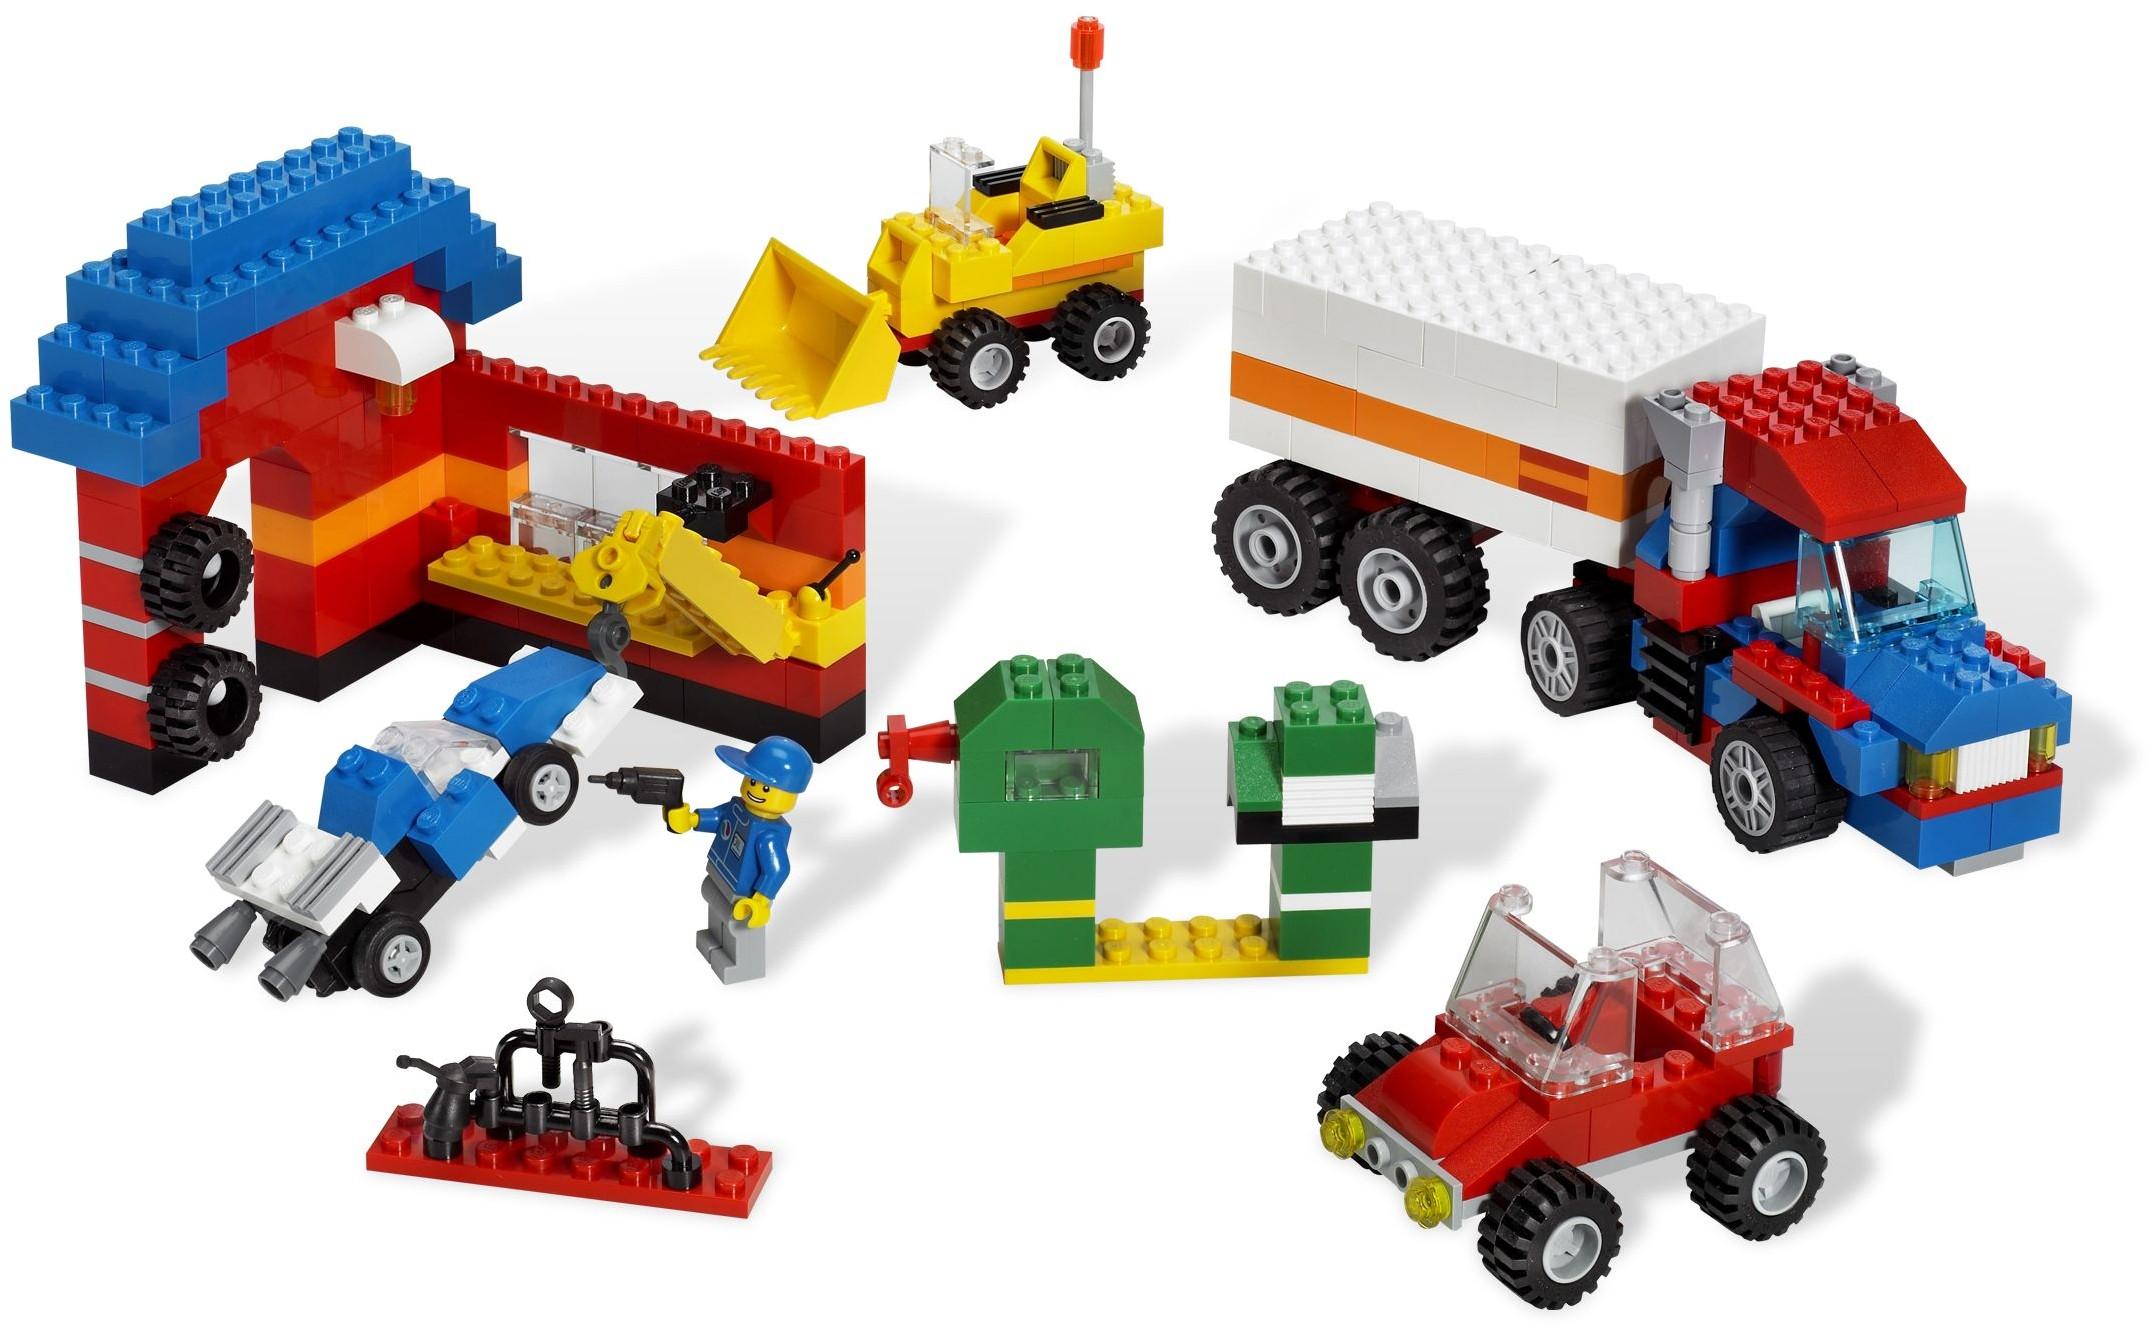 Spongebob squarepants bathroom accessories - Ultimate Lego Vehicle Building Set